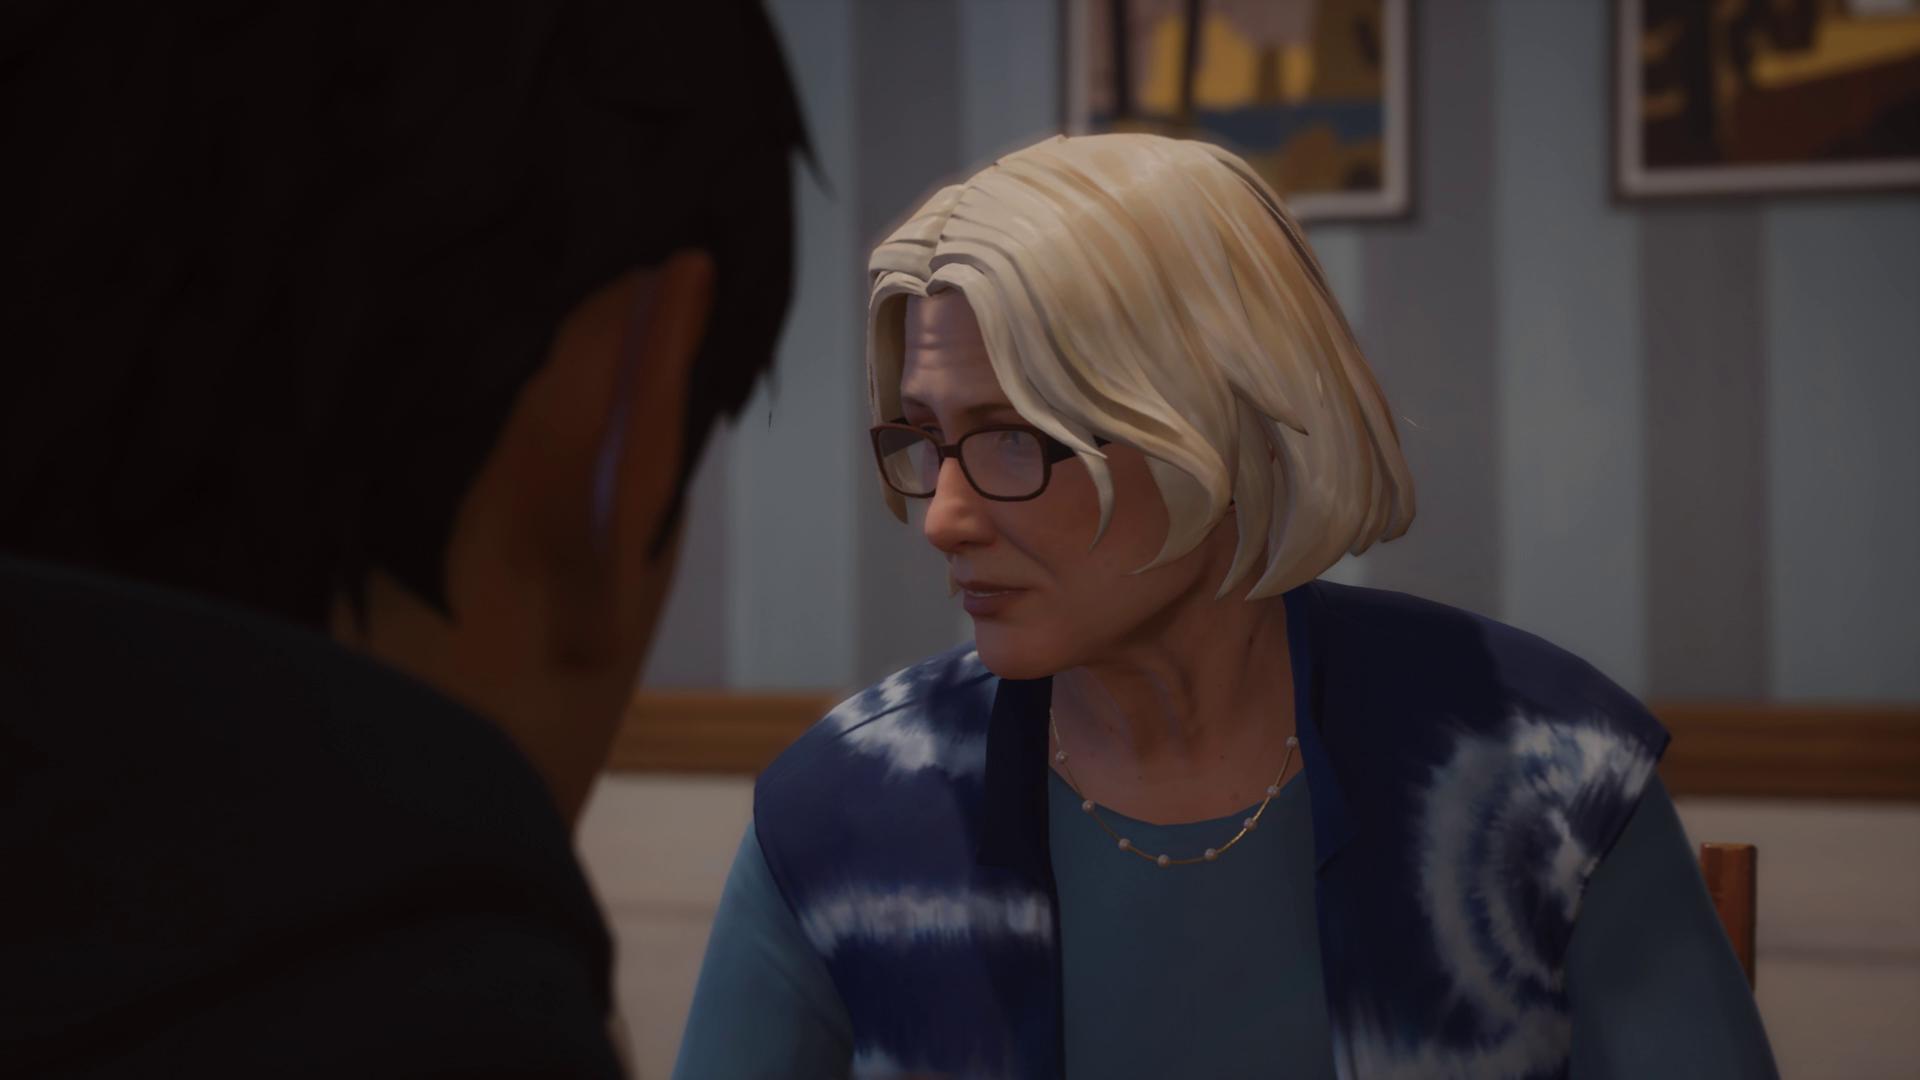 Xbox One Life is Strange 2: Episode 2 - Rules